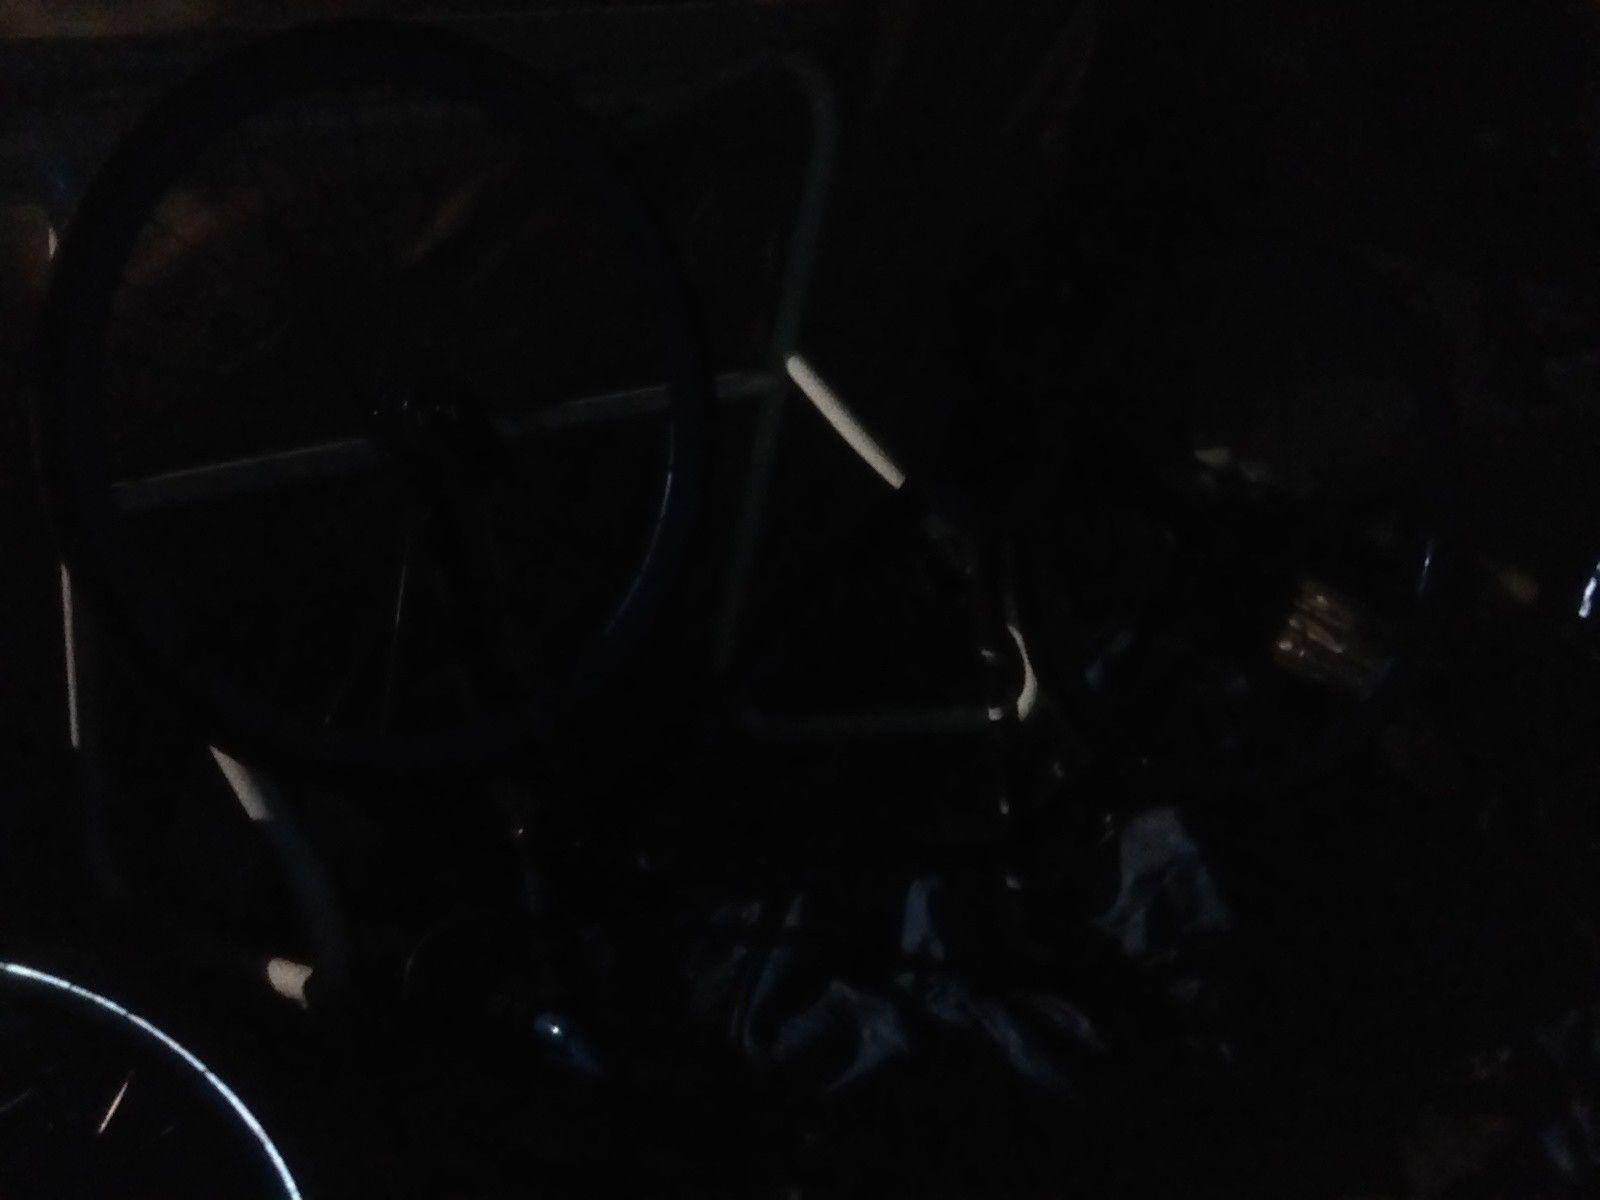 "SE PK Ripper black & blue 26""frame like new.Hardly ever ridden bought New.Custom Carbon Fiber rims vintage saddle leather seat.priced to sell fast."